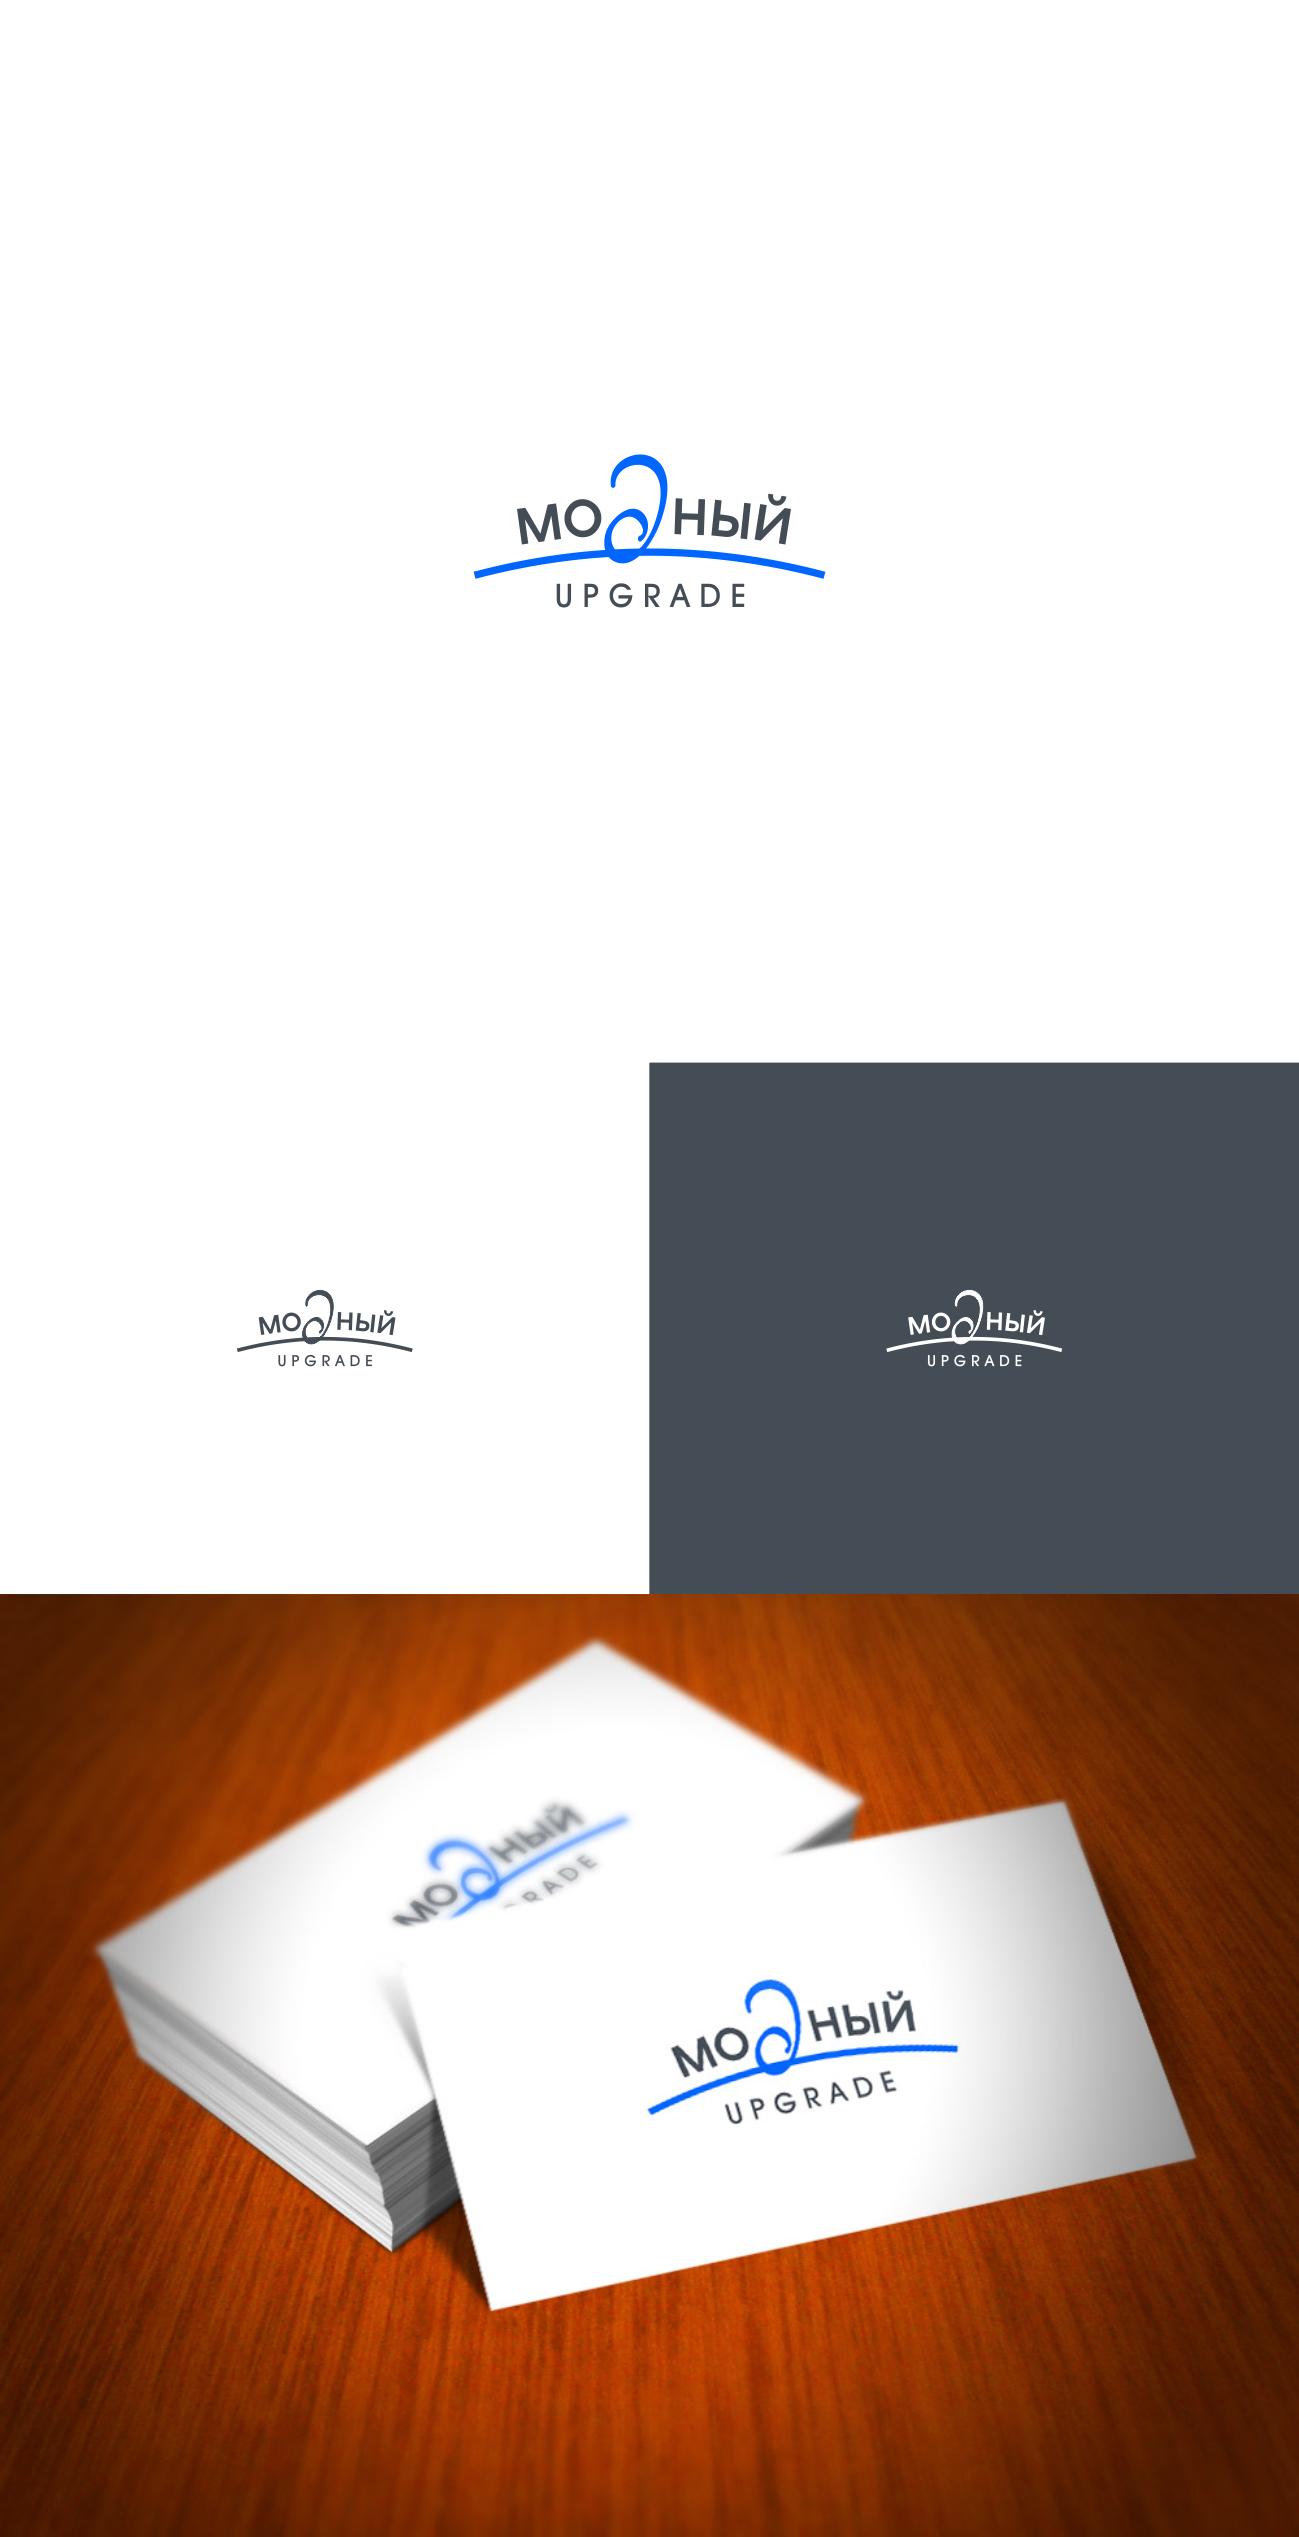 "Логотип интернет магазина ""Модный UPGRADE"" фото f_202594934bf0a999.png"